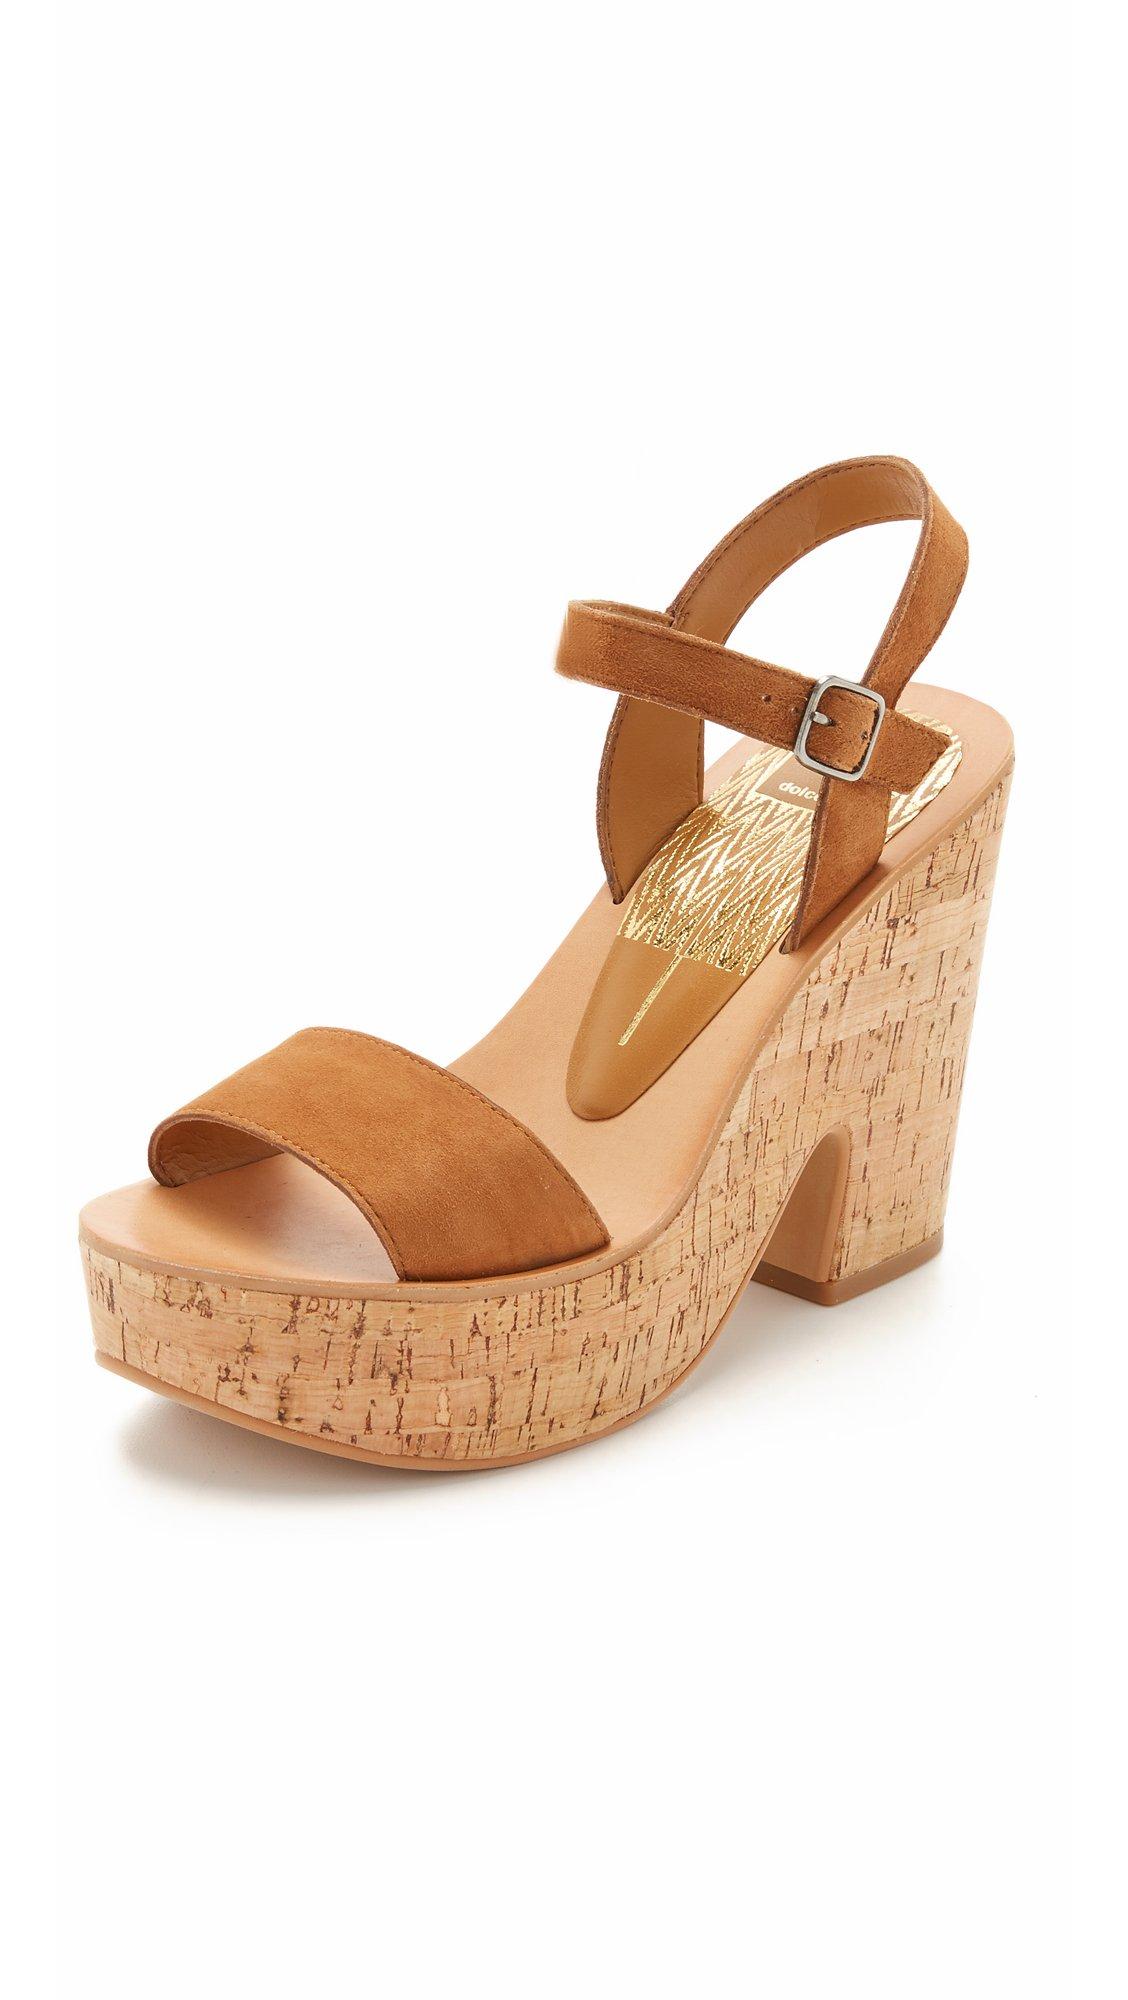 64cde5c2bae Lyst - Dolce Vita Randi Wedge Sandals